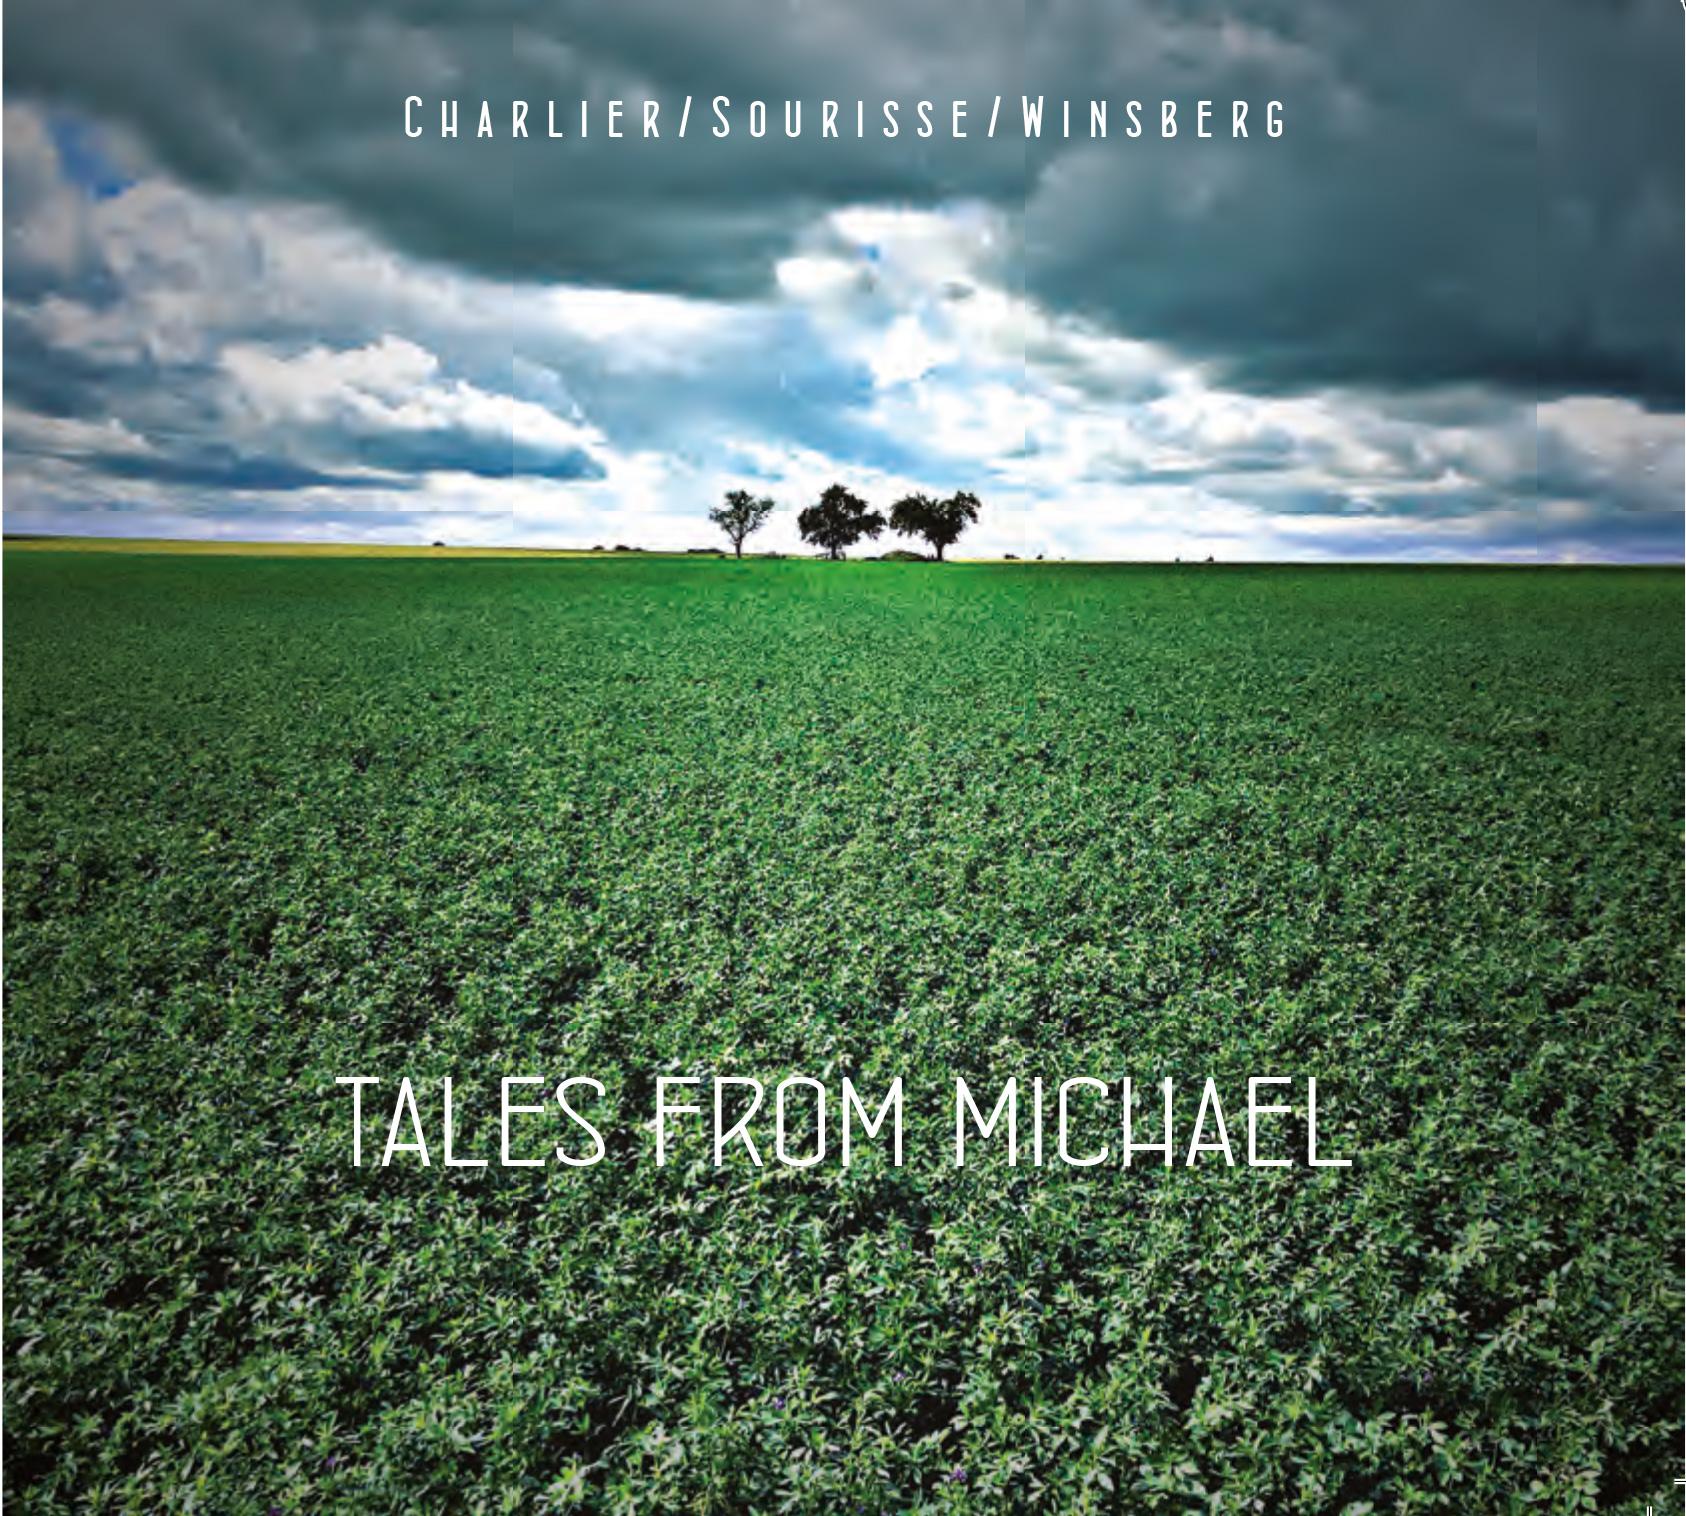 Pochette de l'abum Tales From Michael du Trio Charlier/Sourisse/Winsberg